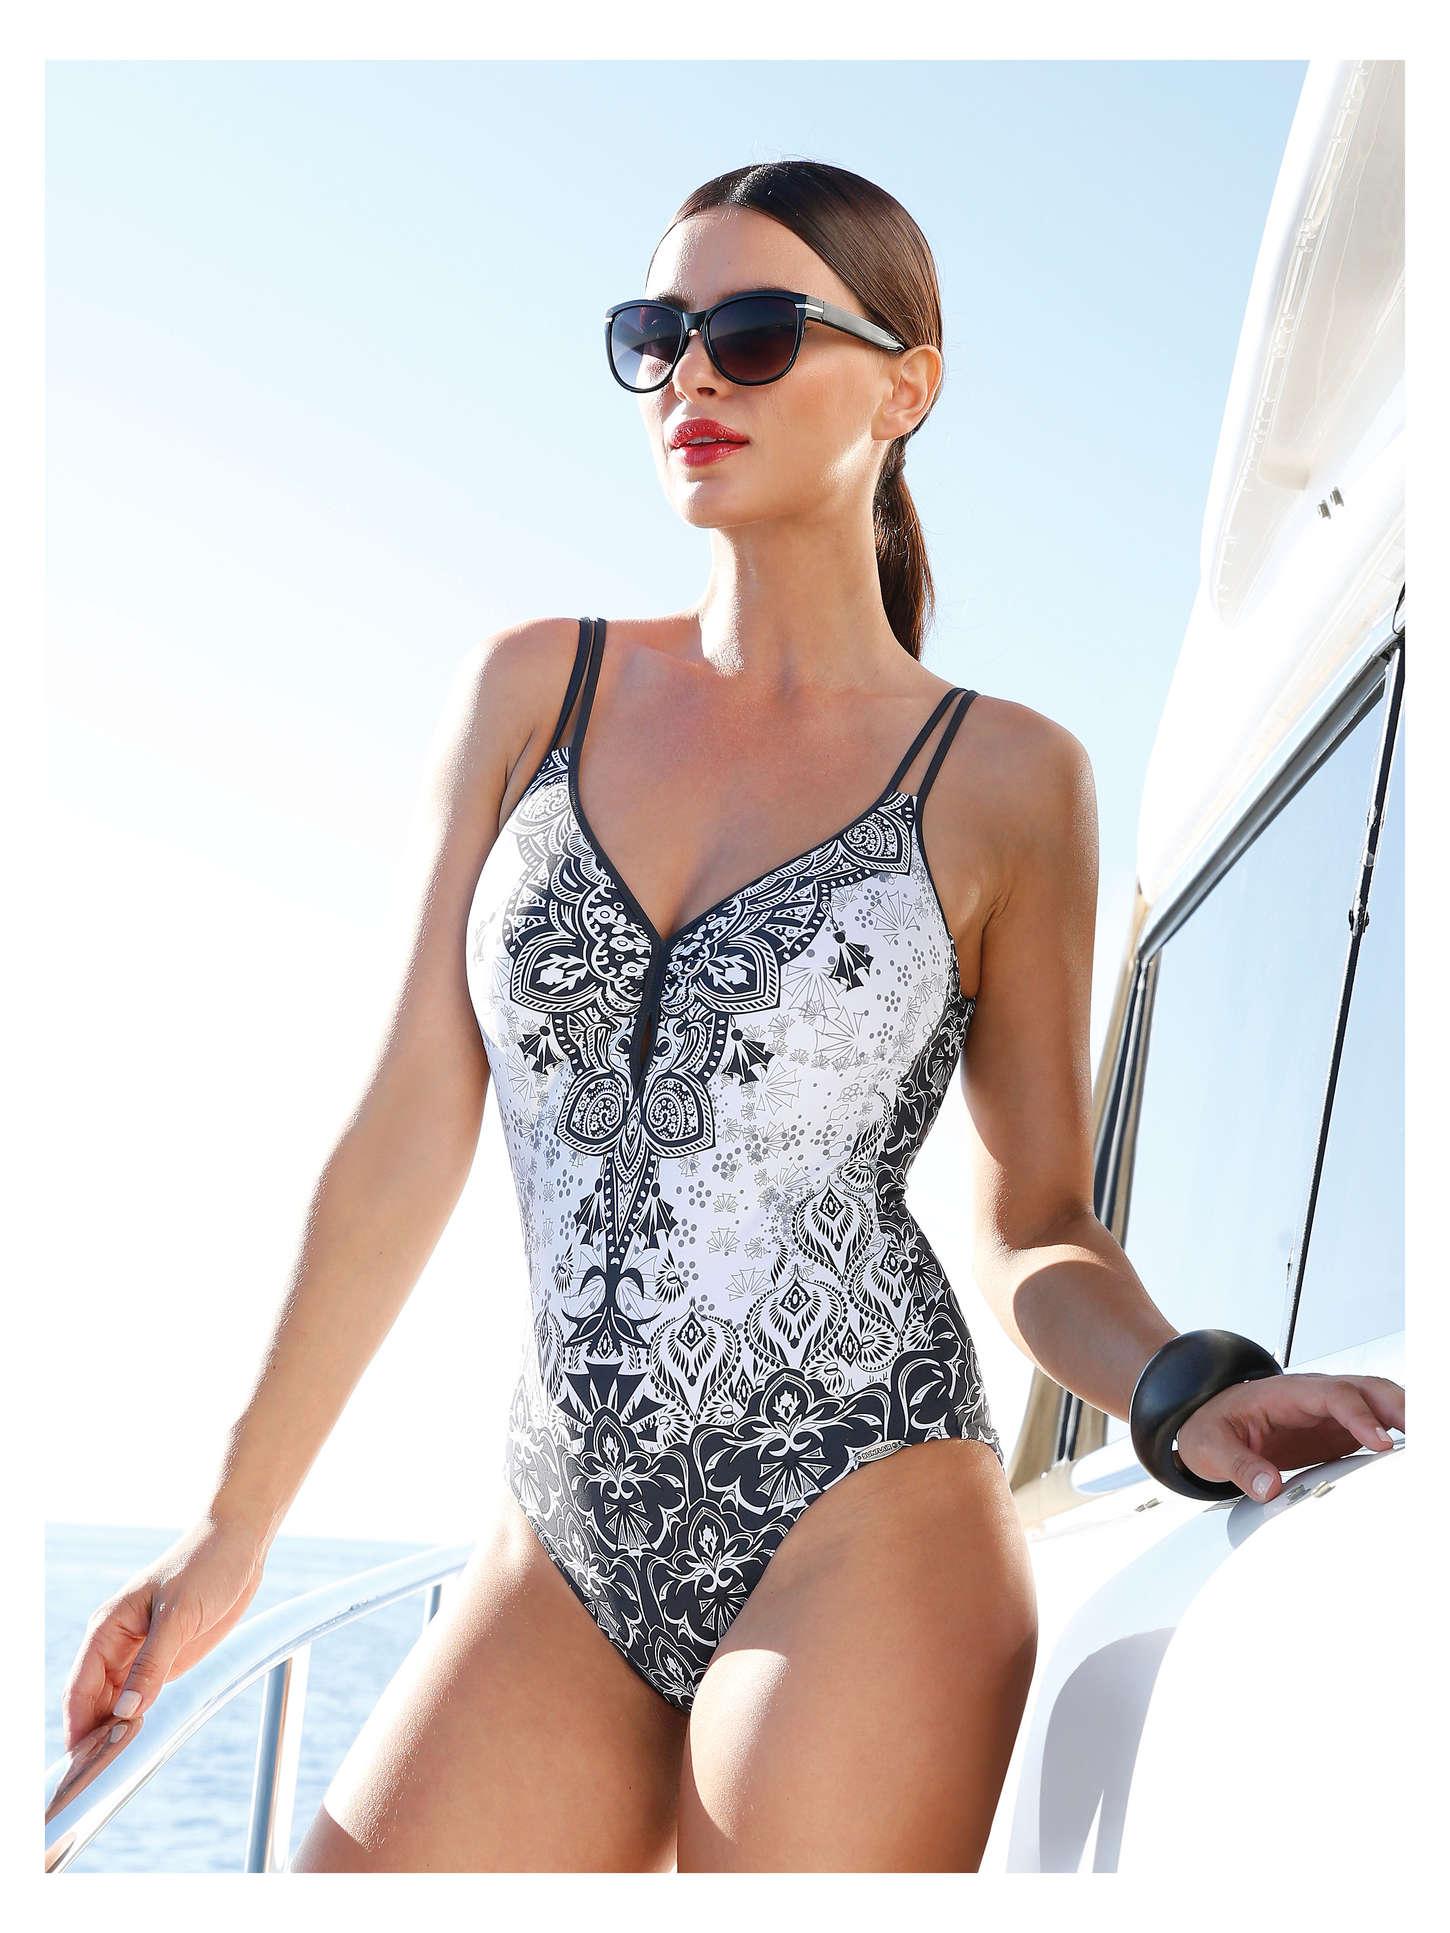 Catrinel Menghia Sunflair Swimwear